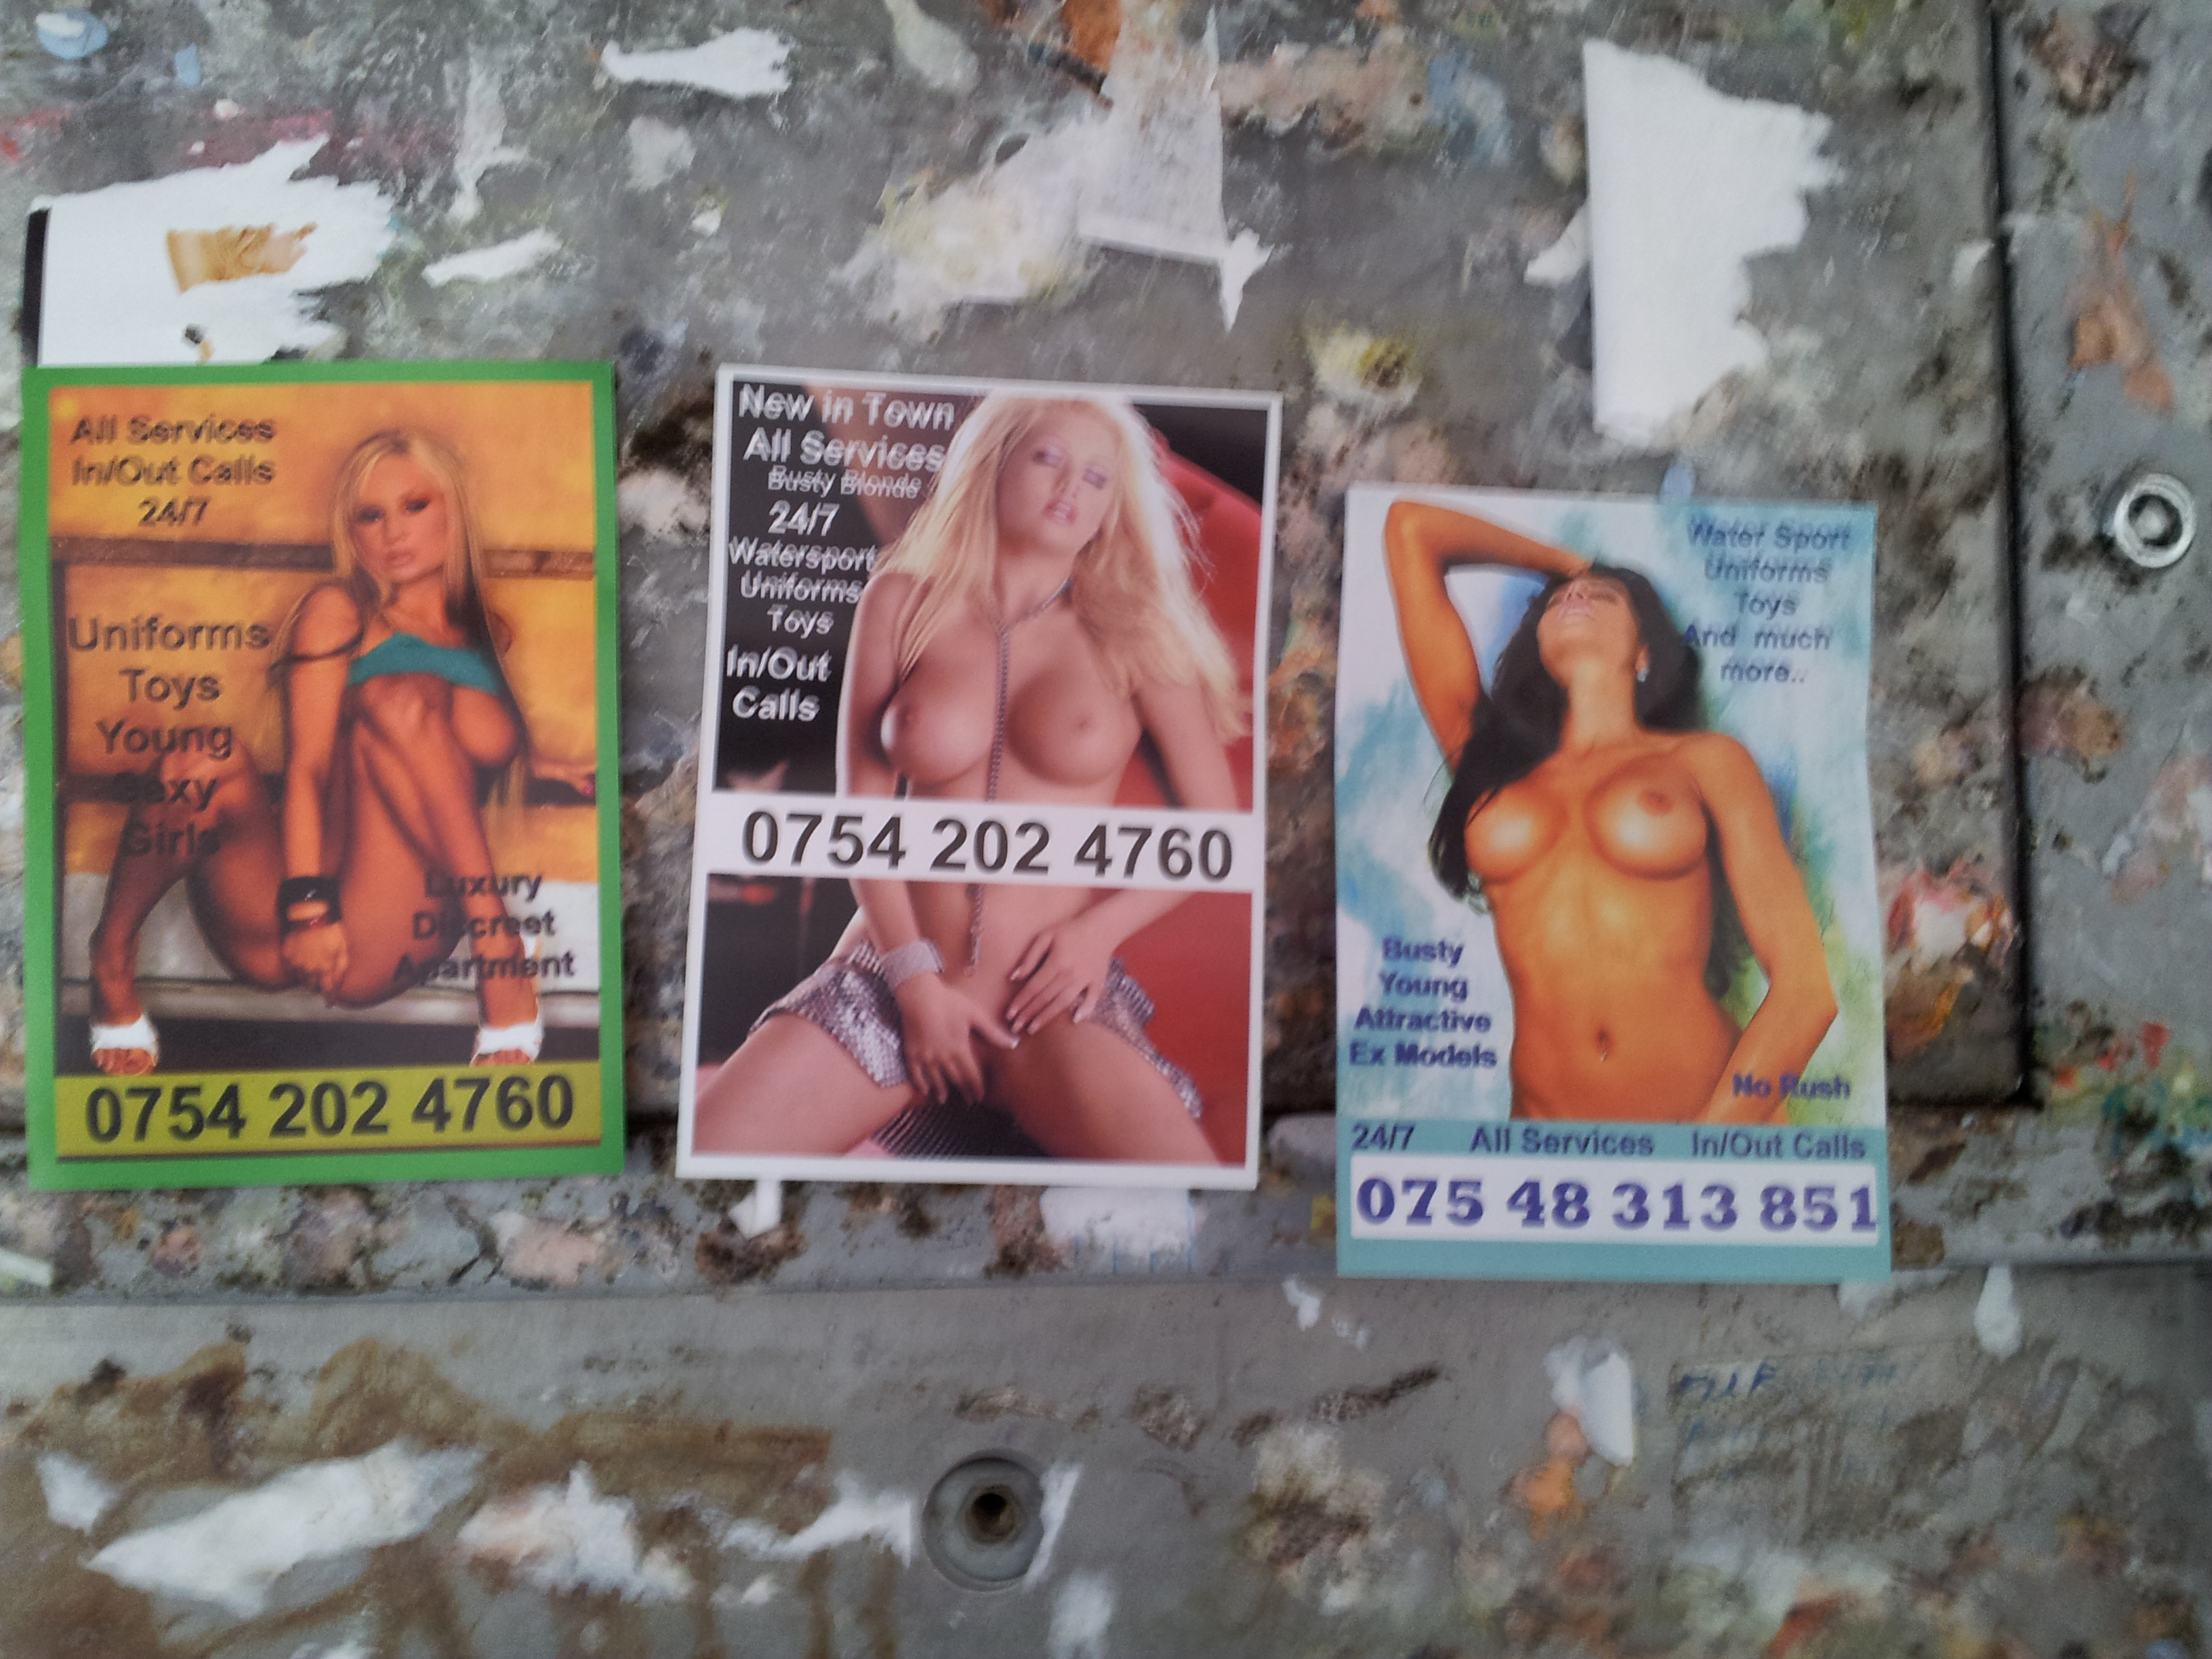 prostitute services locanto personal services